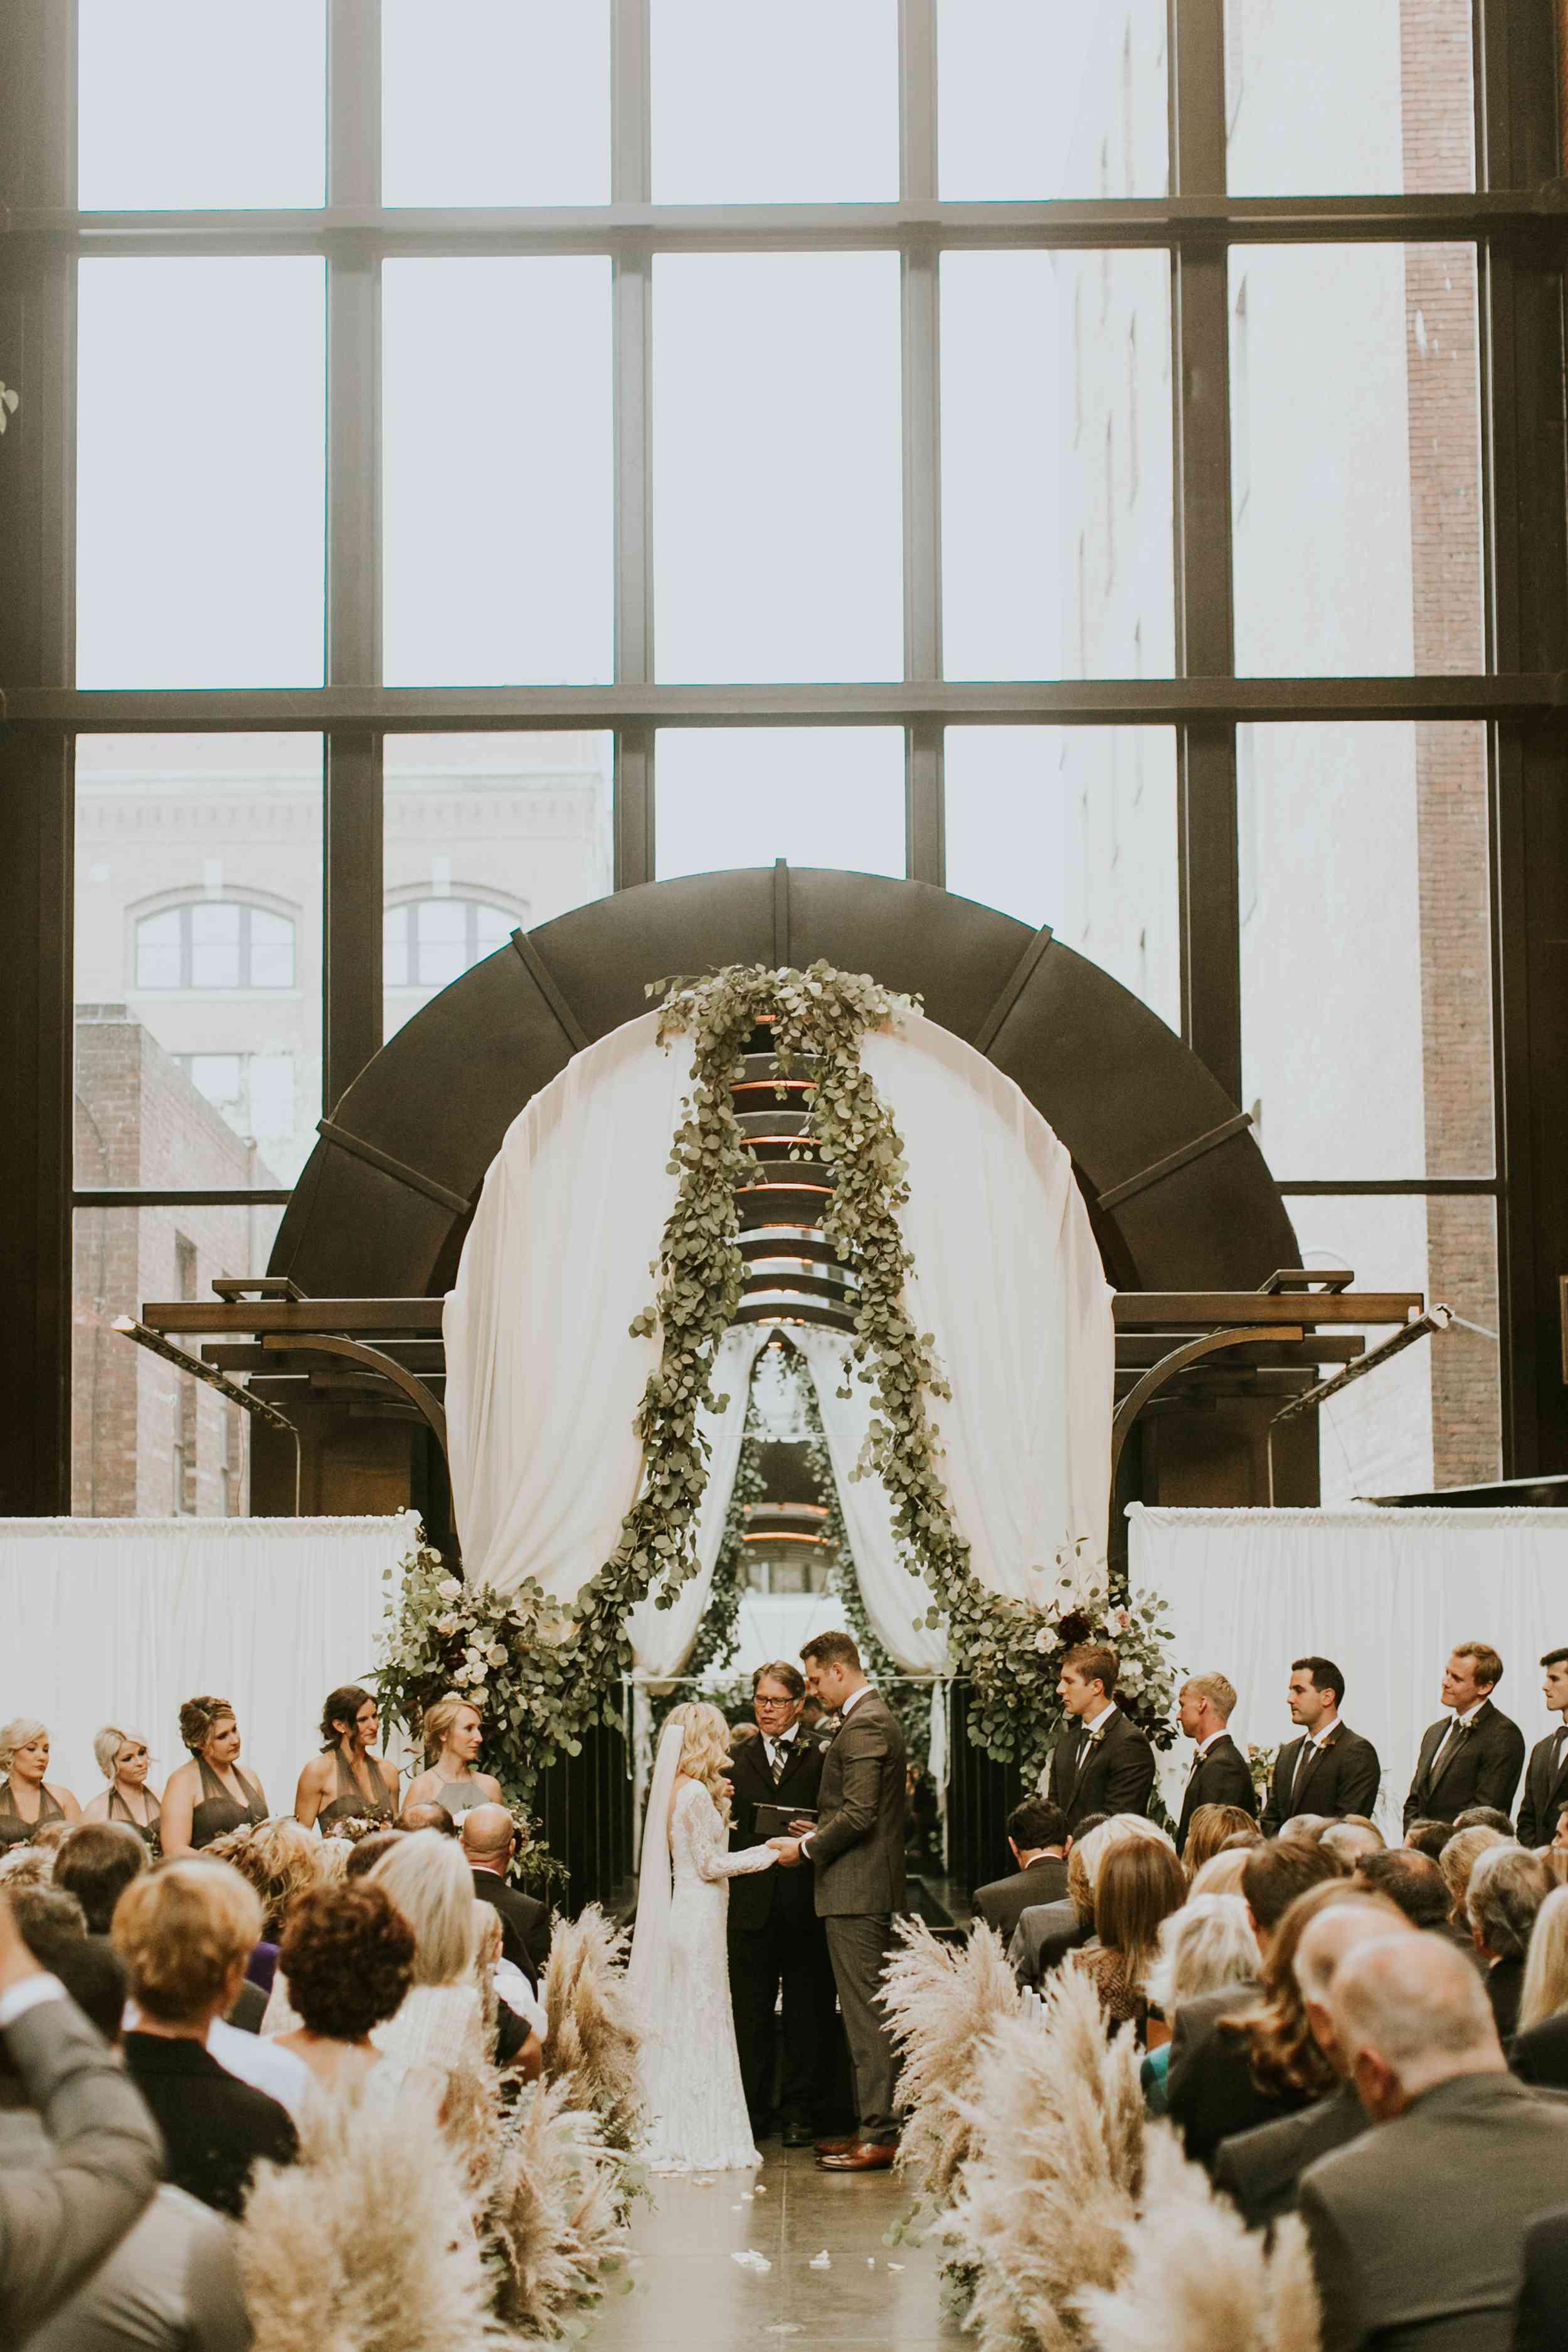 Modern archway wedding ceremony